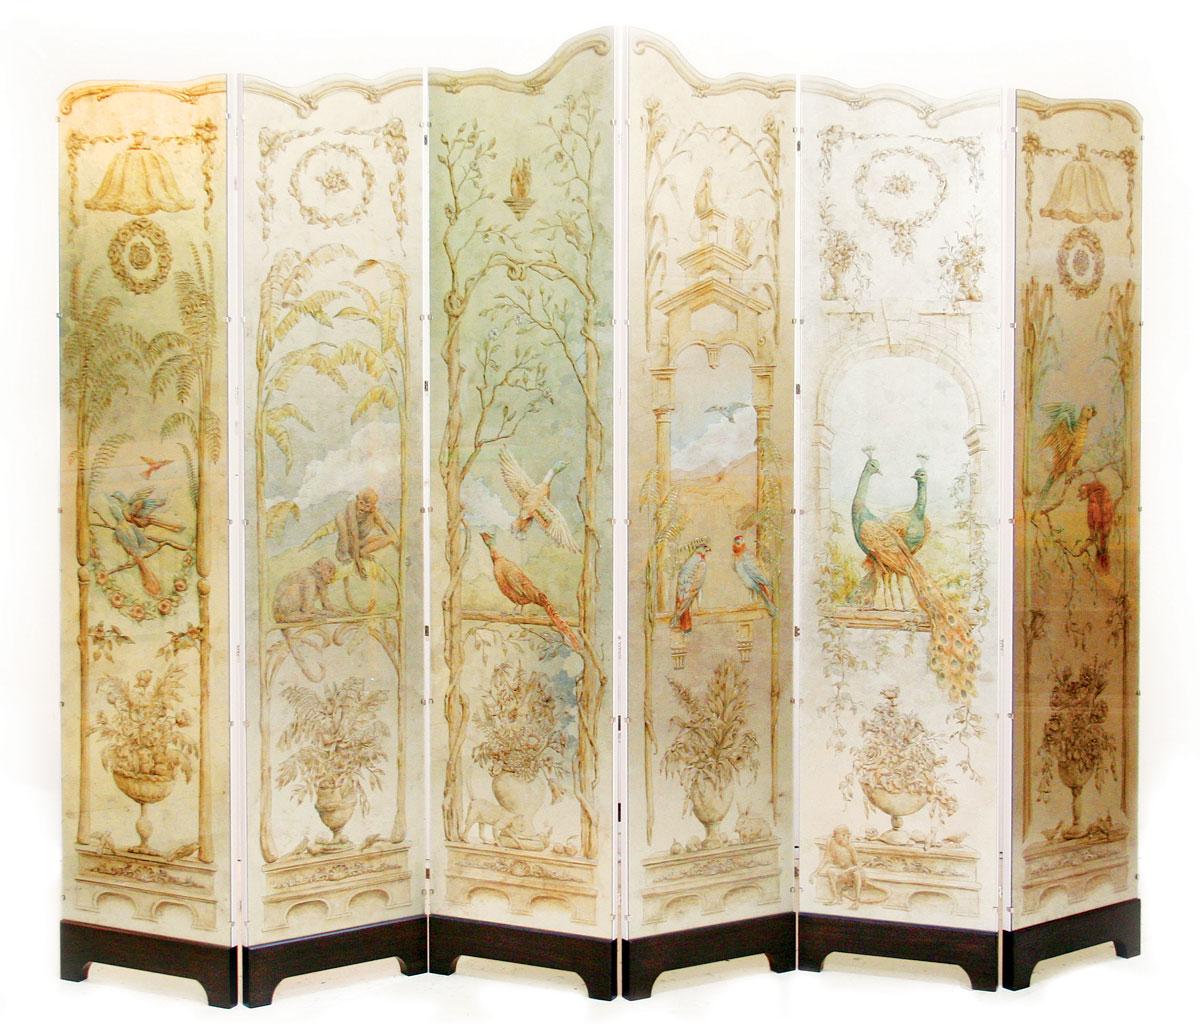 chinoiserie panel by Gorman Studios